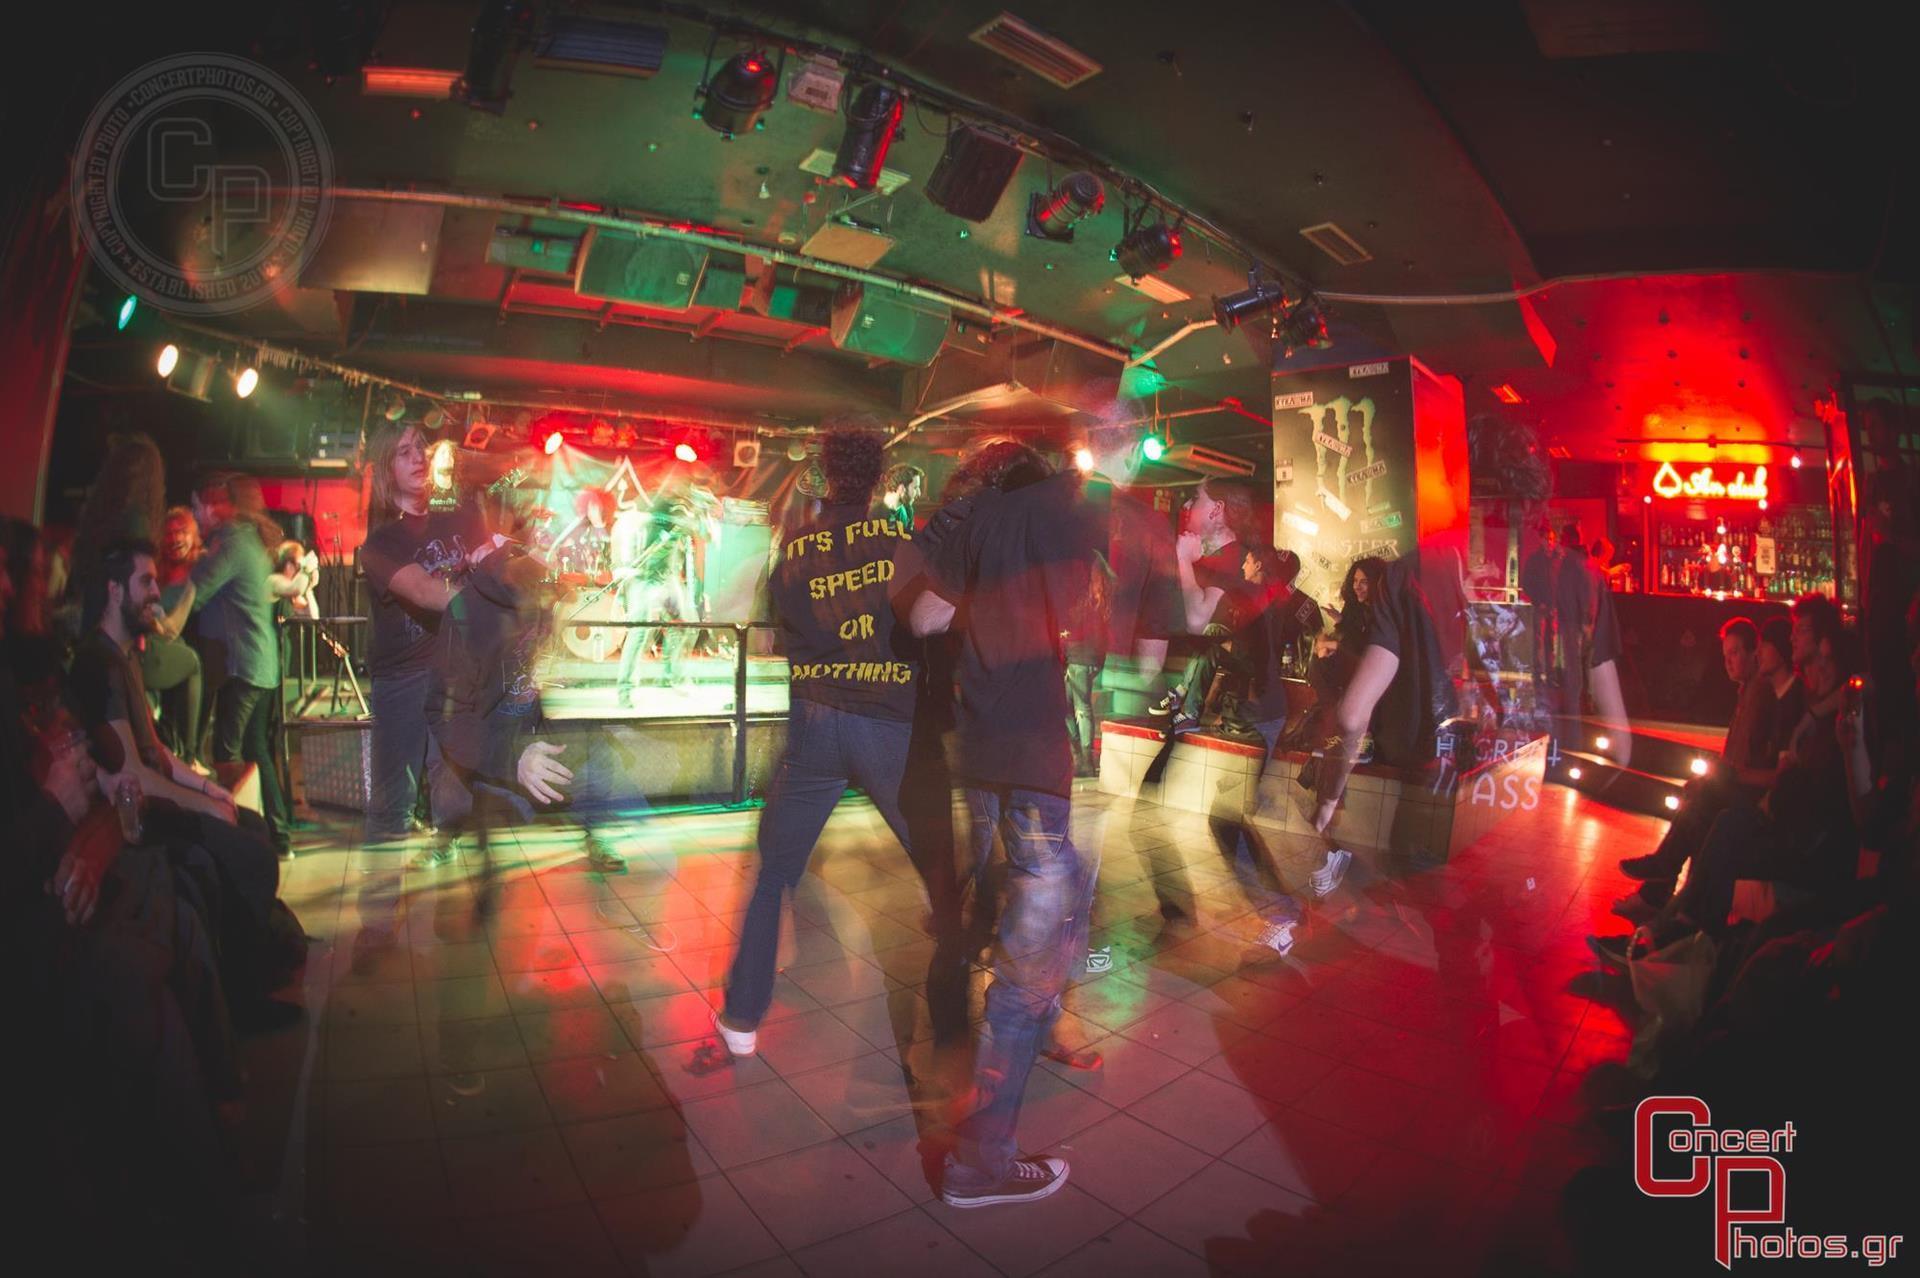 Battle Of The Bands Athens - Leg 3- photographer:  - ConcertPhotos - 20150104_2319_34